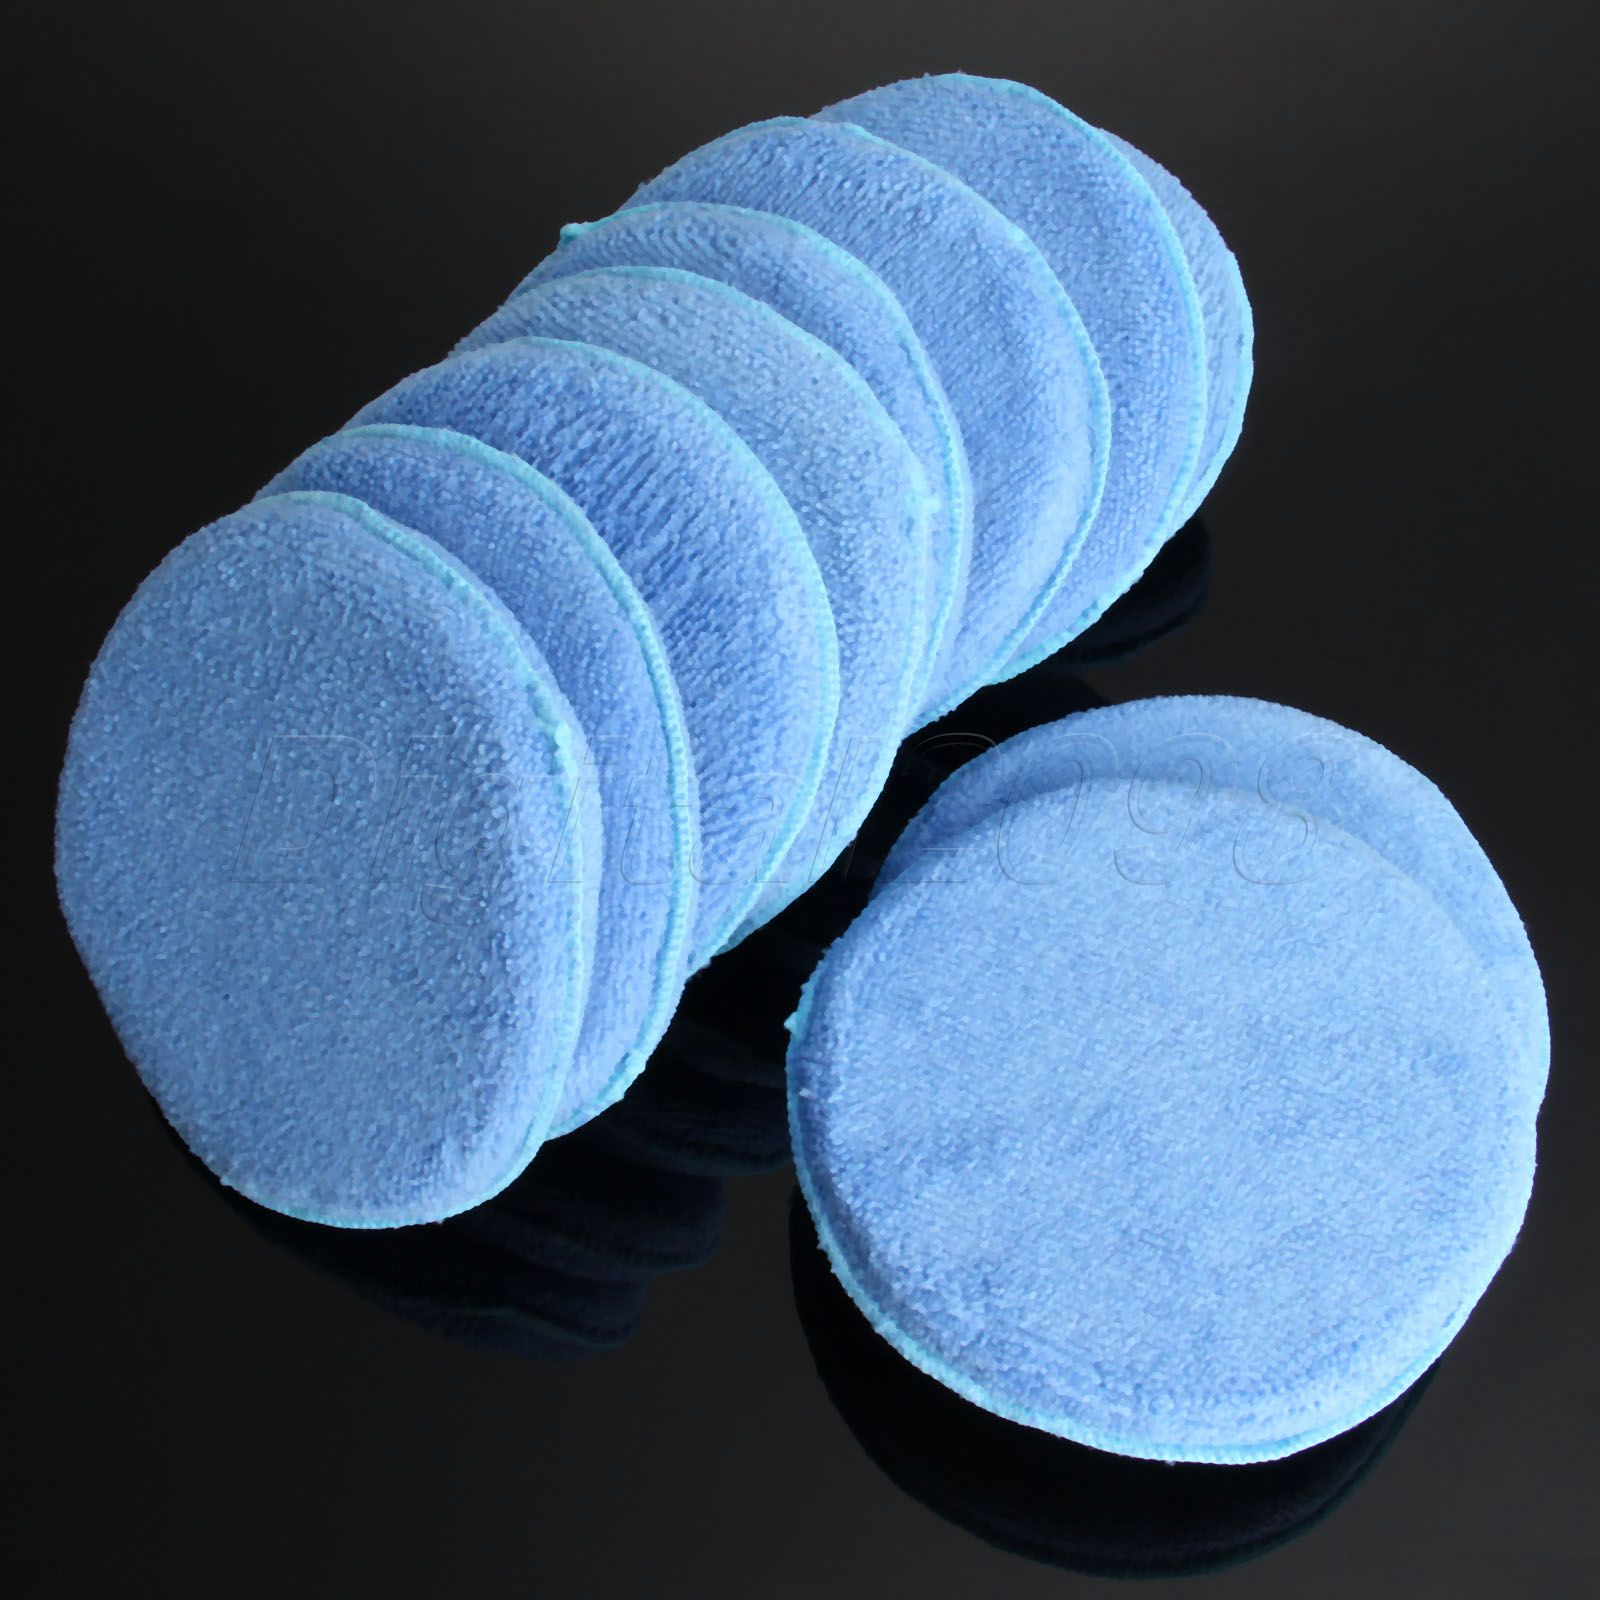 Yetaha 10Pcs 6 Inch 150mm Soft Microfiber Car Waxing Polishing Applicator Pads Foam Sponge Buffing Pads For Car Wash Detailing